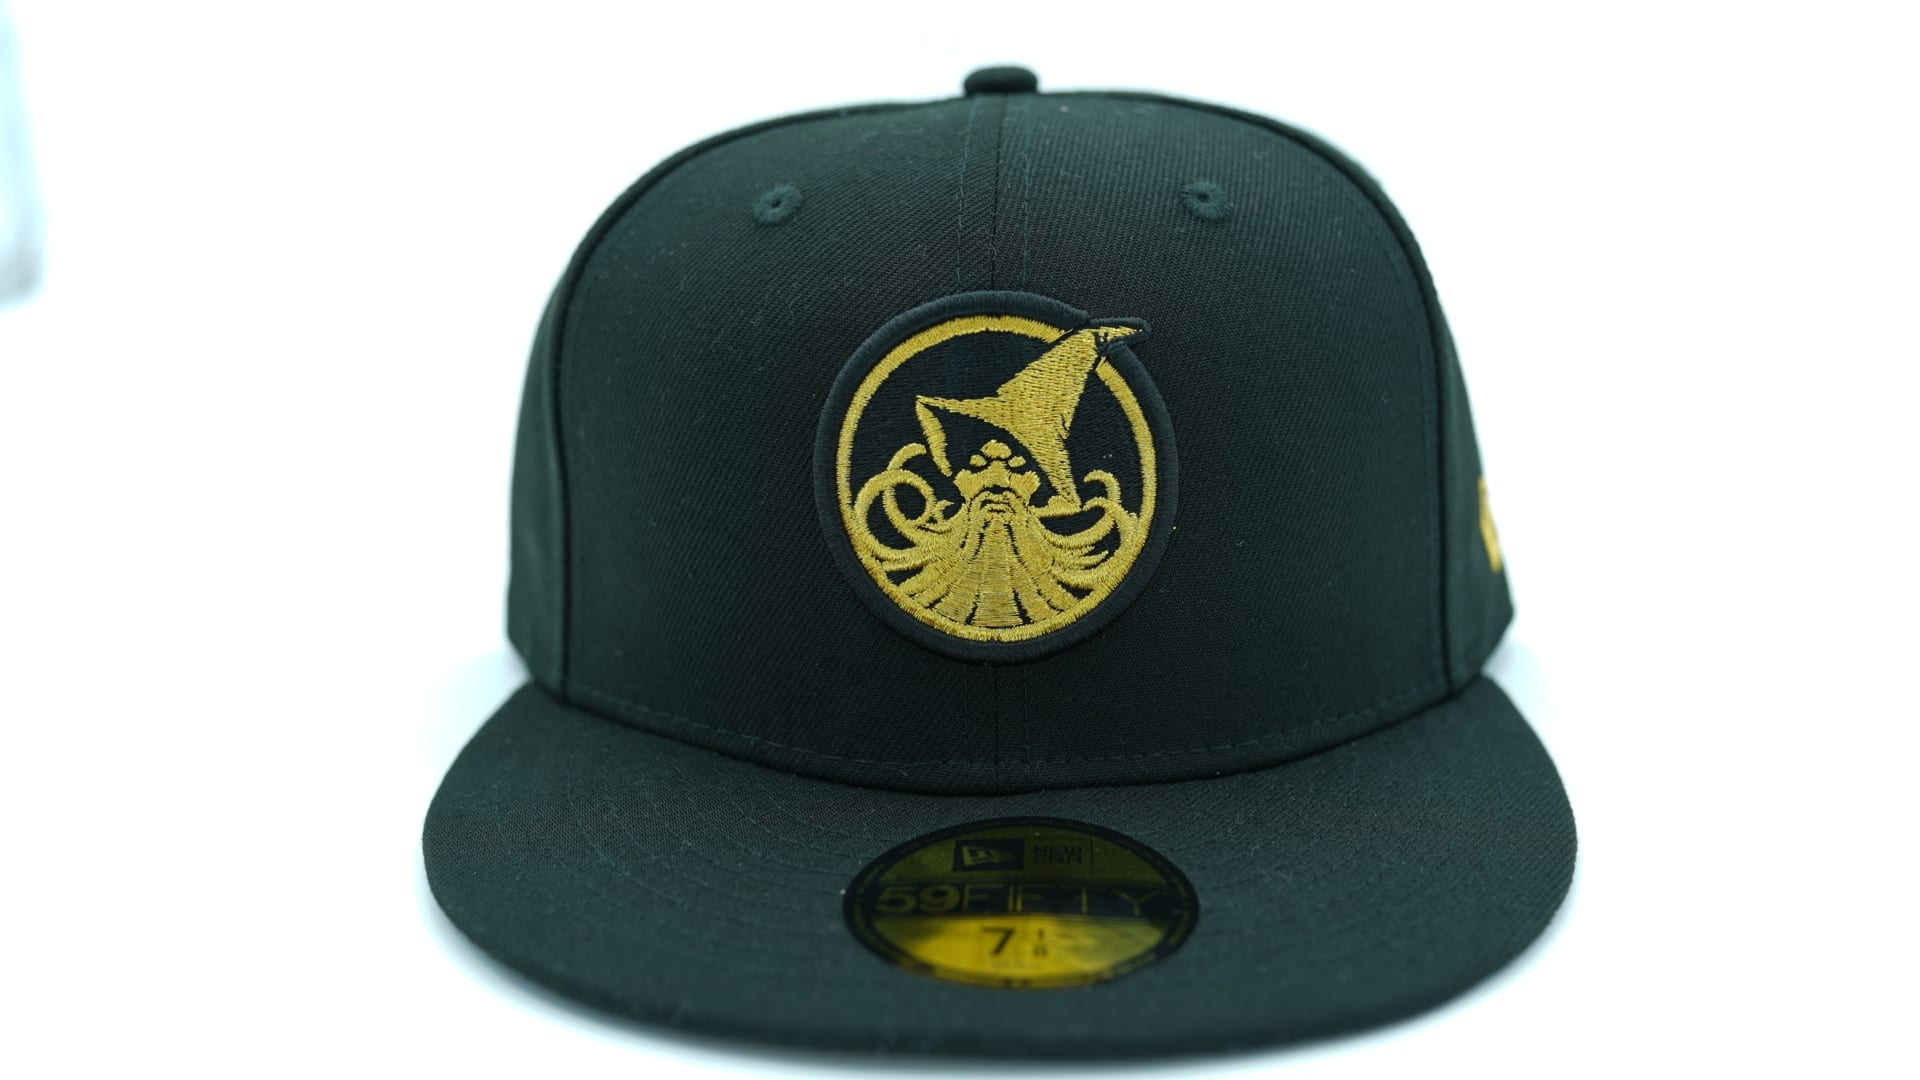 baltimore black sox team classical 59fifty fitted baseball cap new era negro league